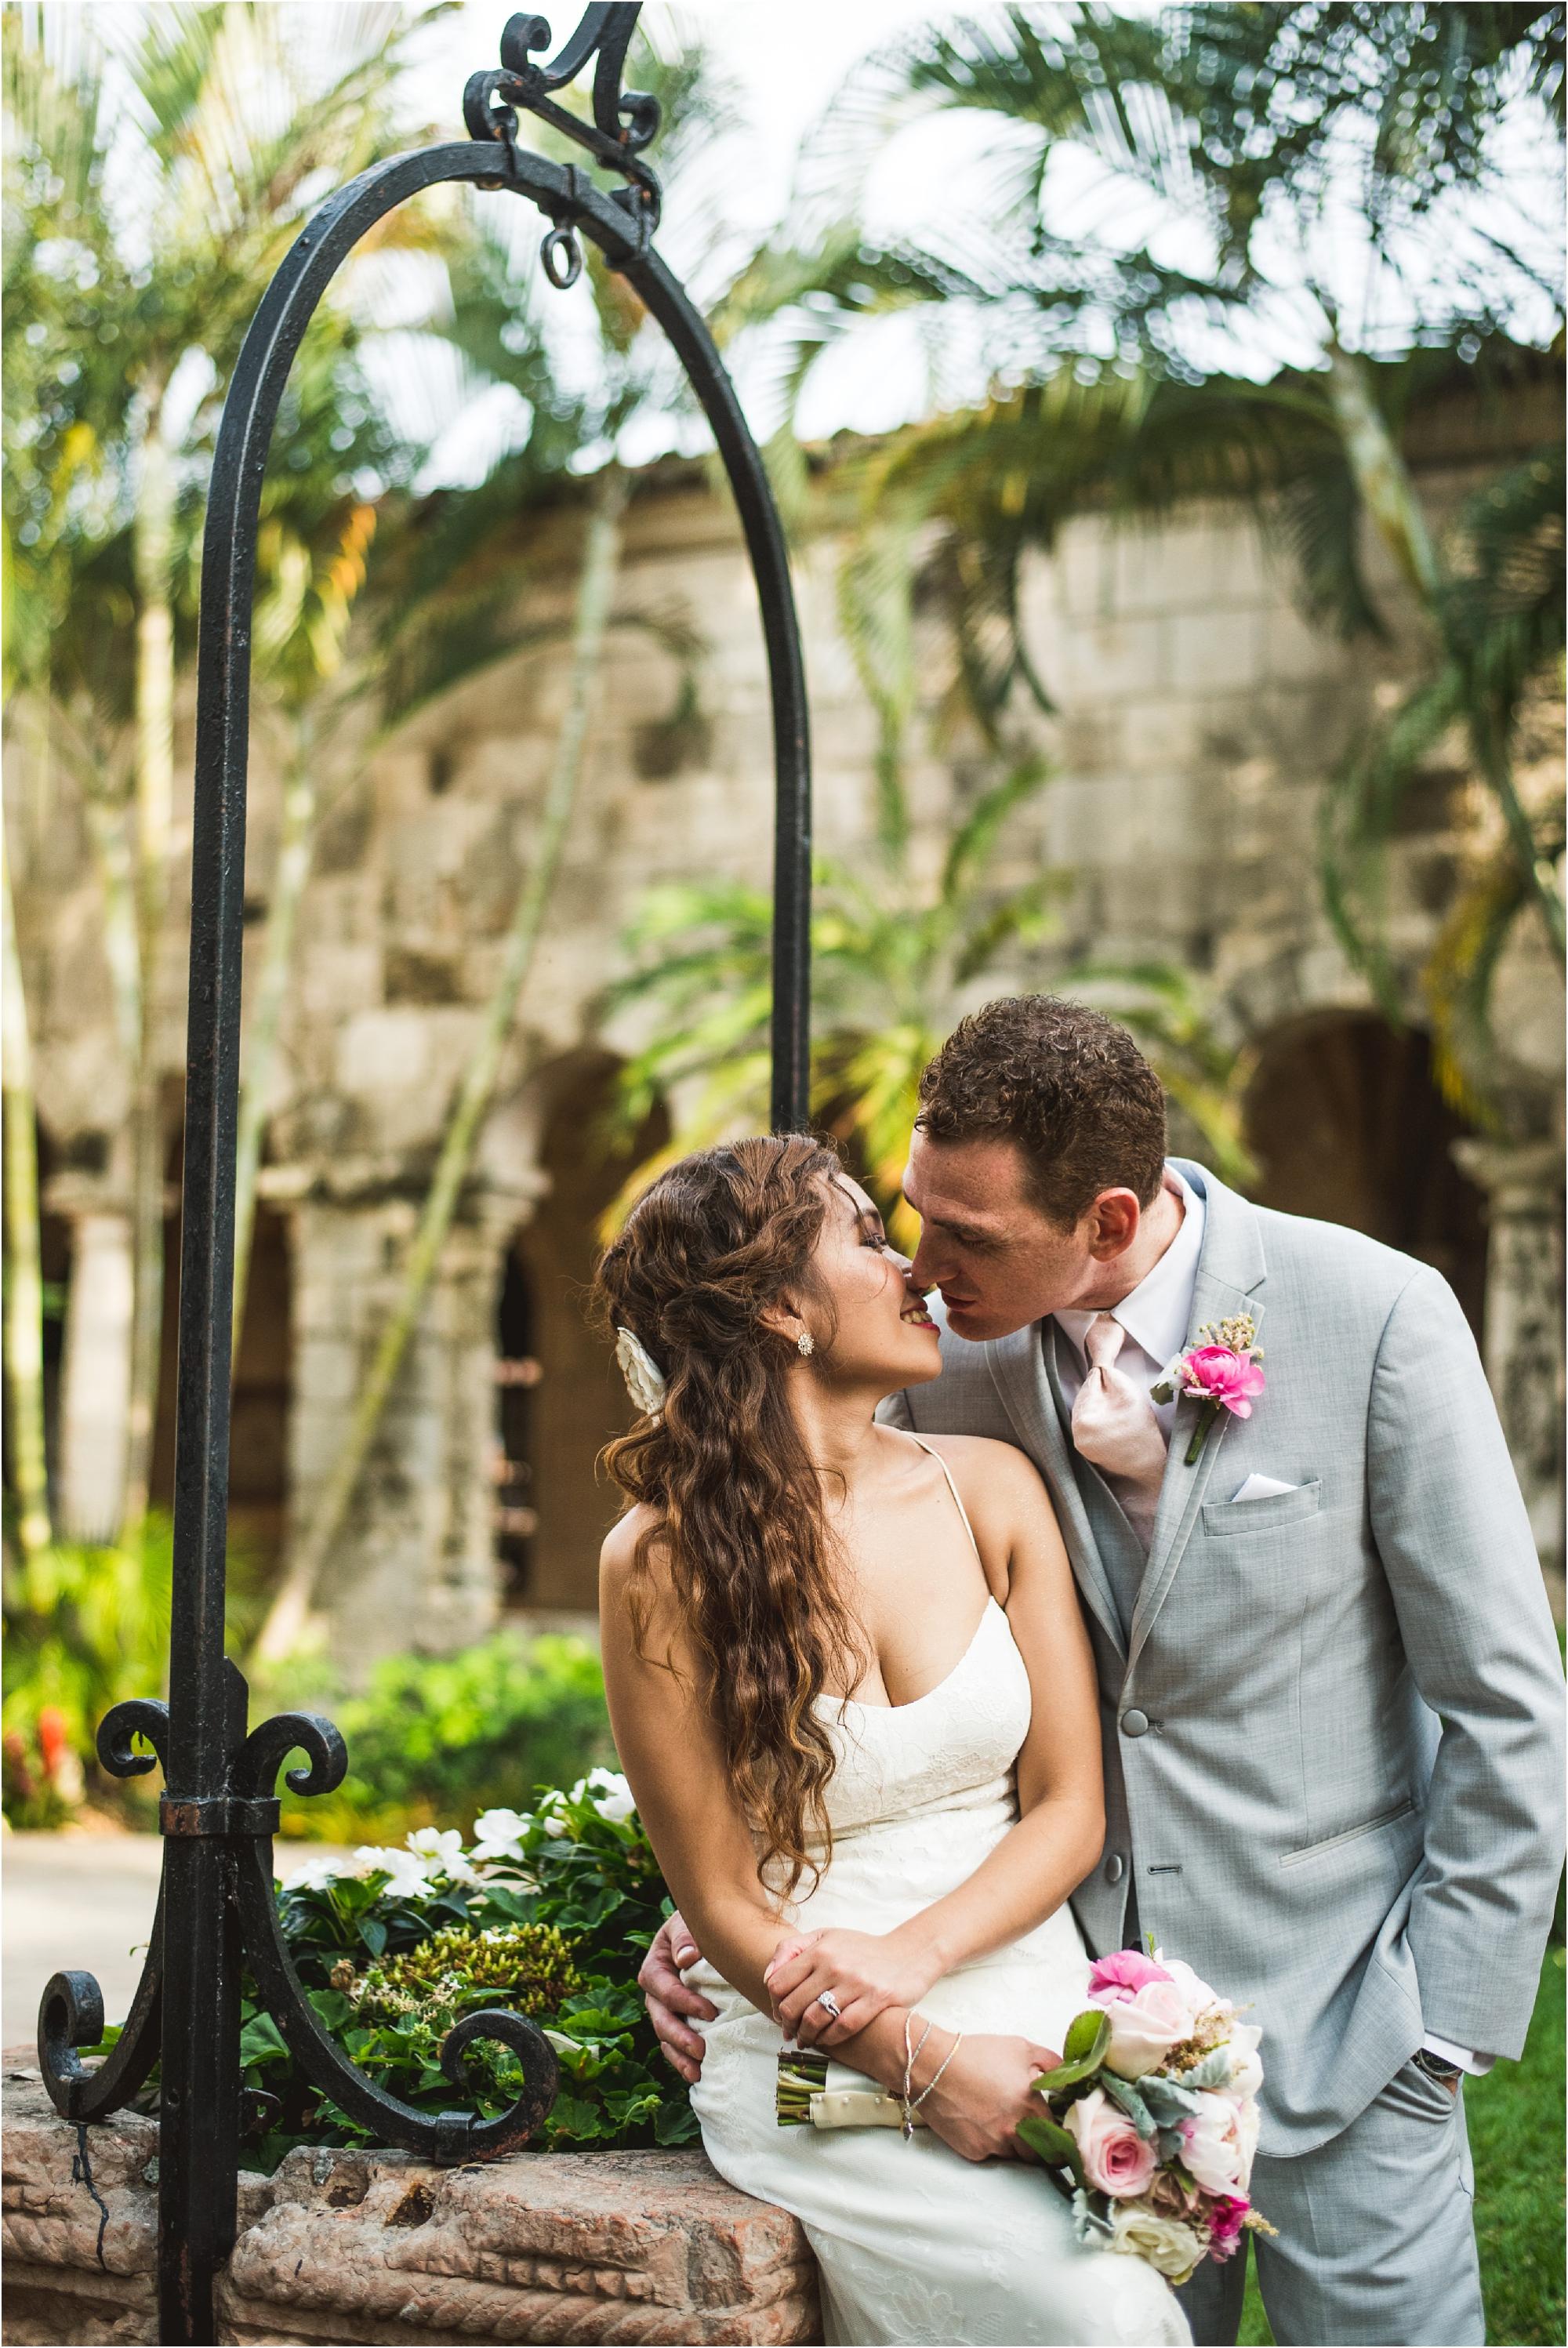 Spanish-Monastery-miami-beach-outdoor-elegant-wedding-photographer-jessenia-gonzalez_1198.jpg